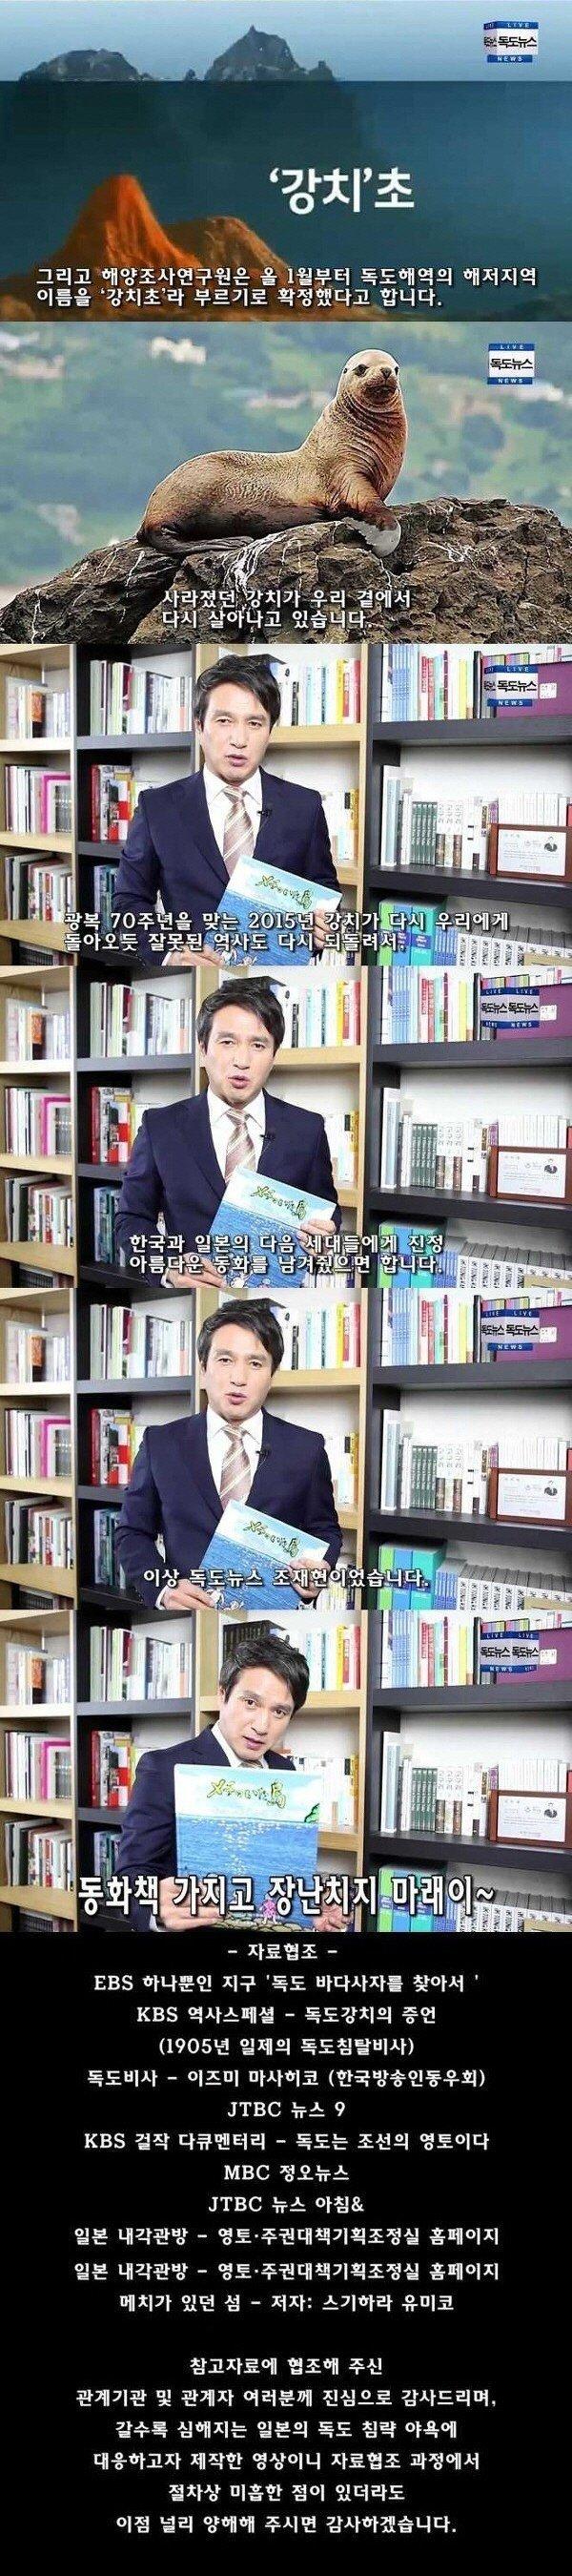 c8e6a3db792a7f53109599c095ad278b.jpg 일본의 독도 세뇌교육